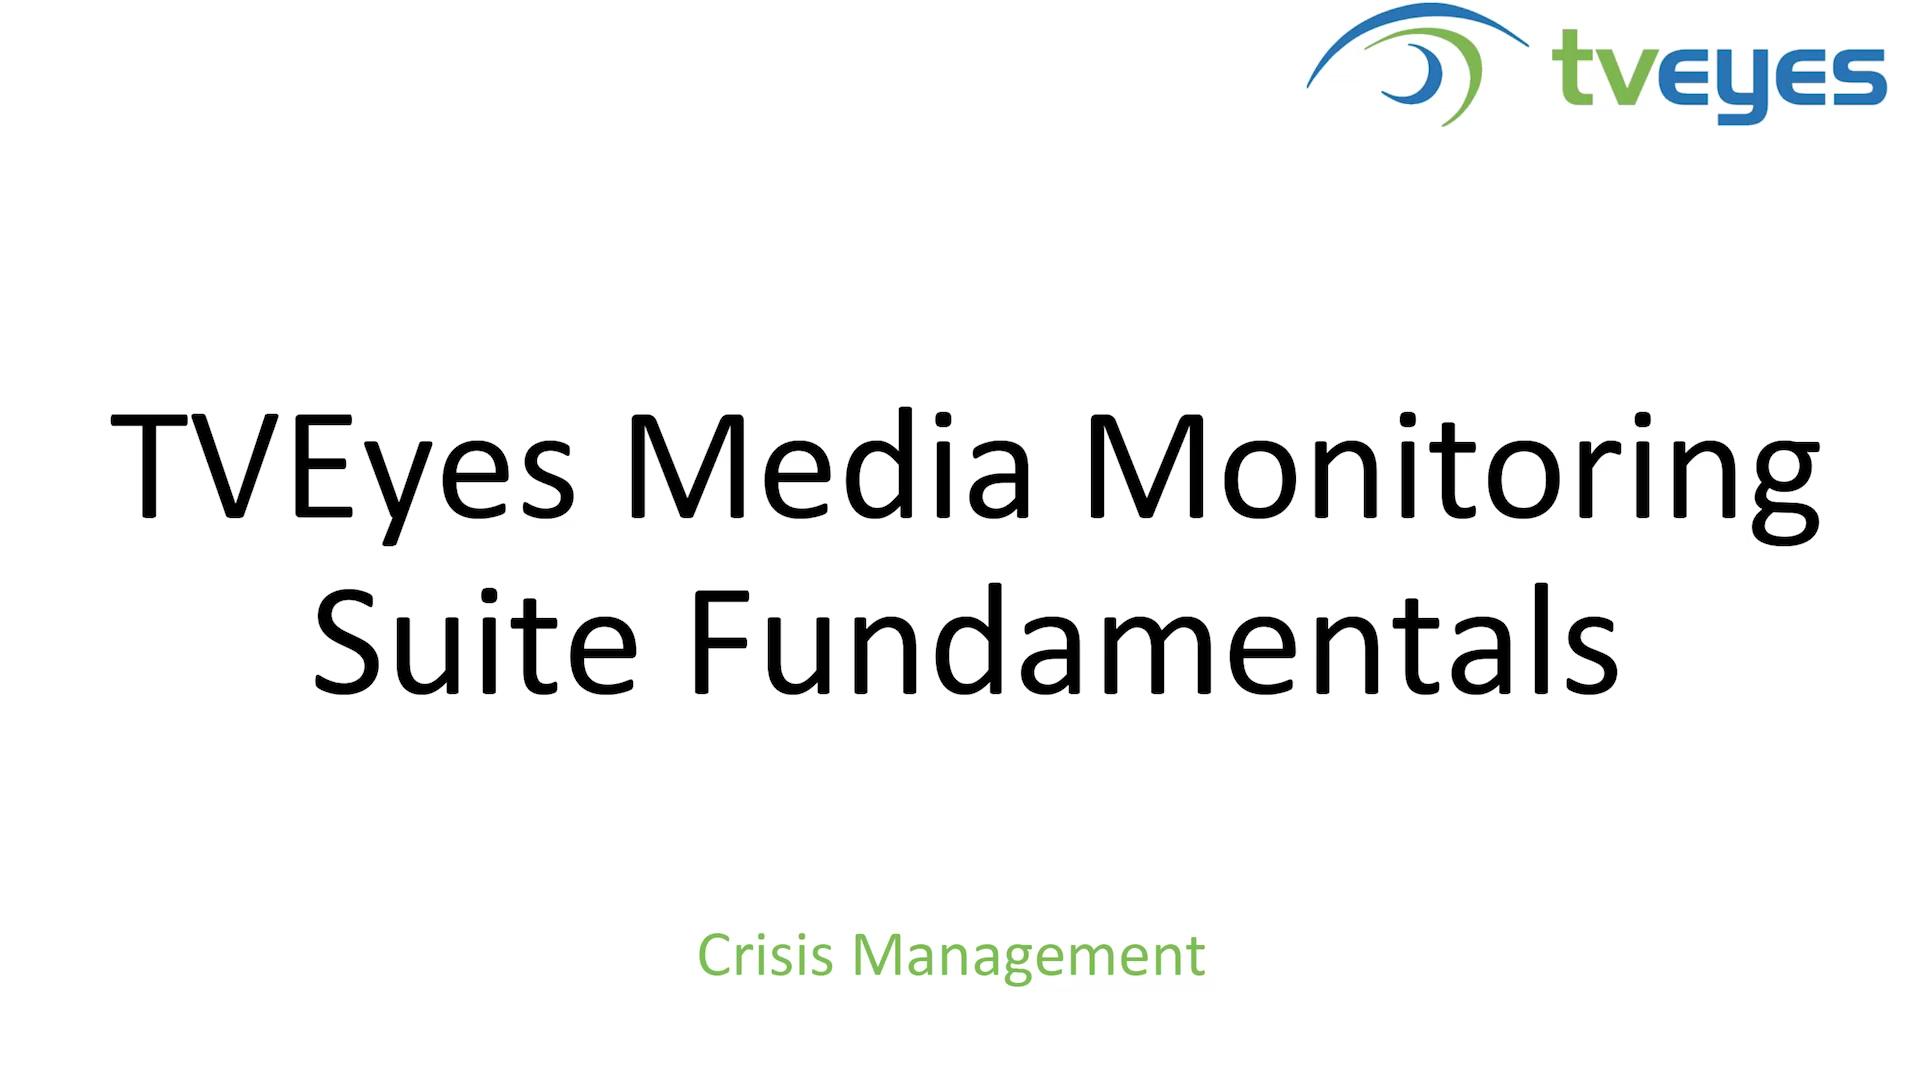 TVEyes Media Monitoring Suite Crisis Management Fundamentals_1